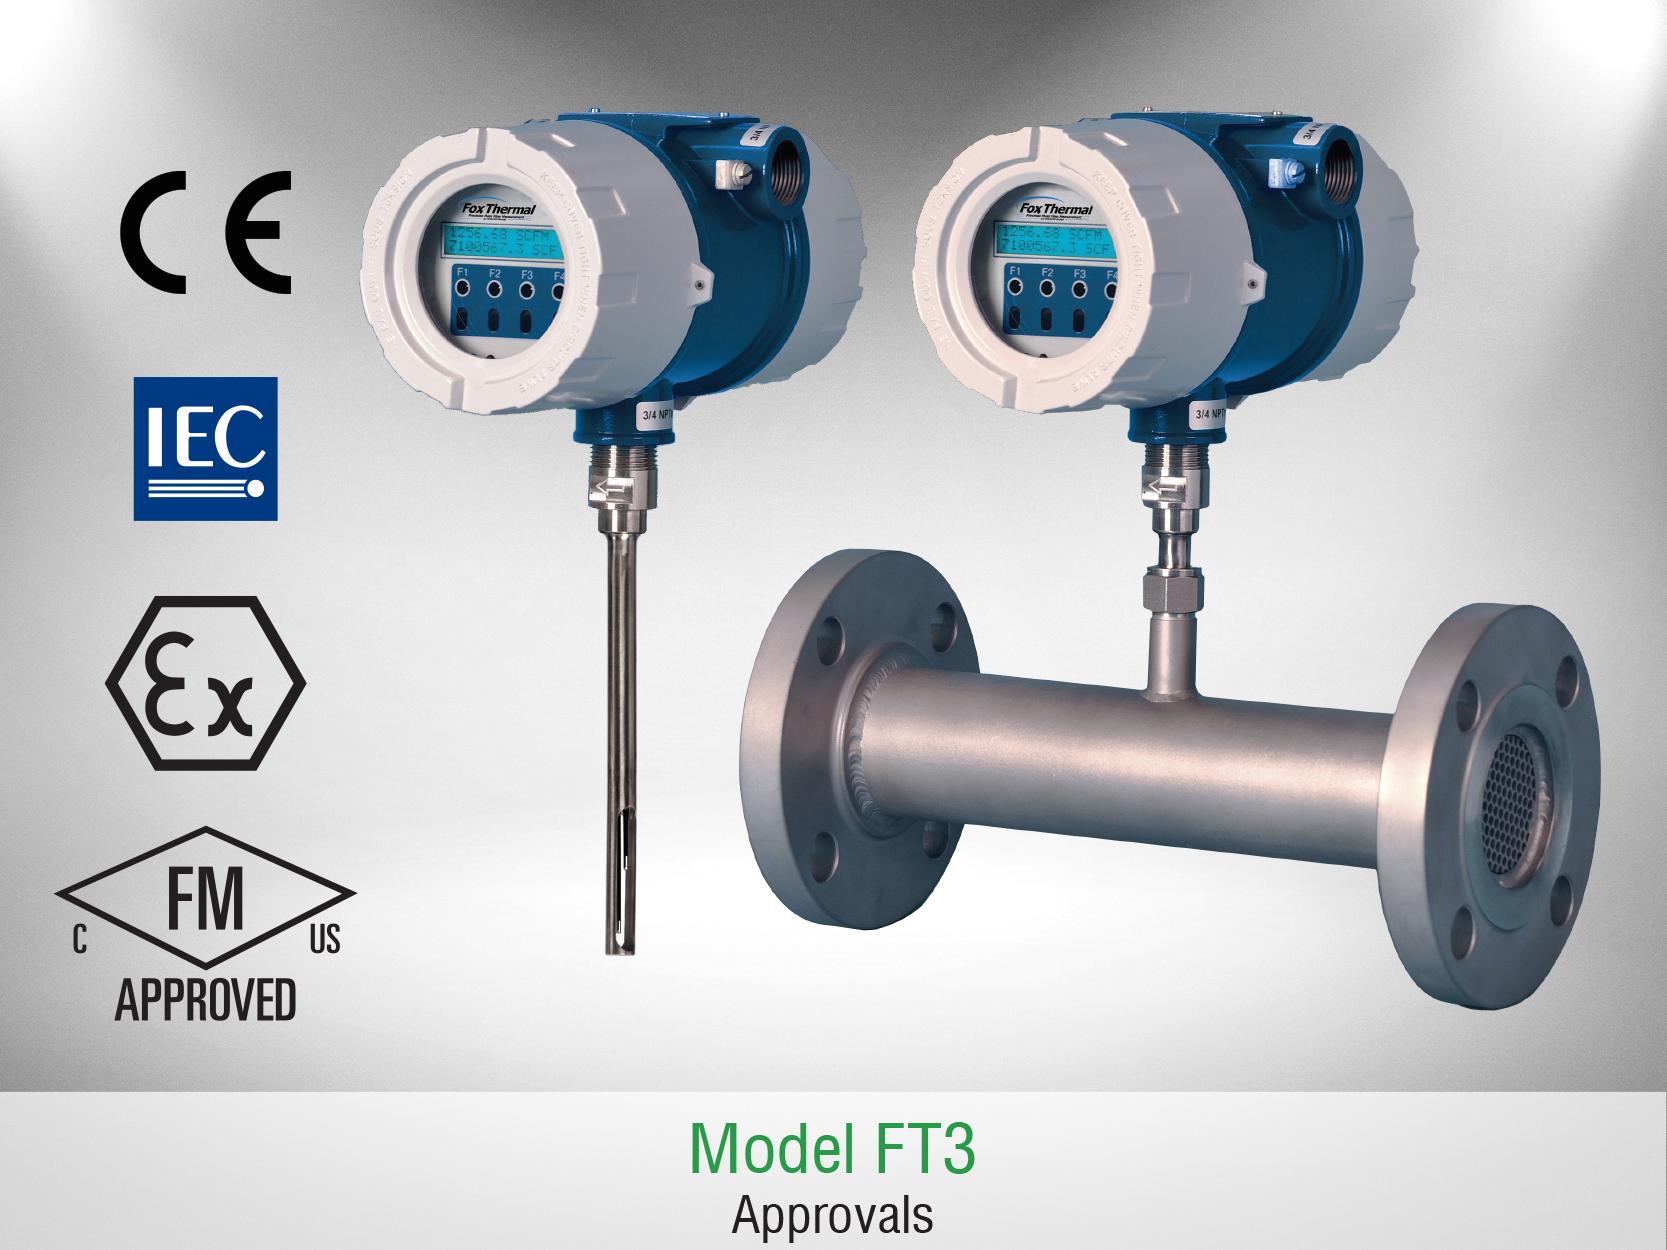 Fox Thermal Model FT3 Flow Meter